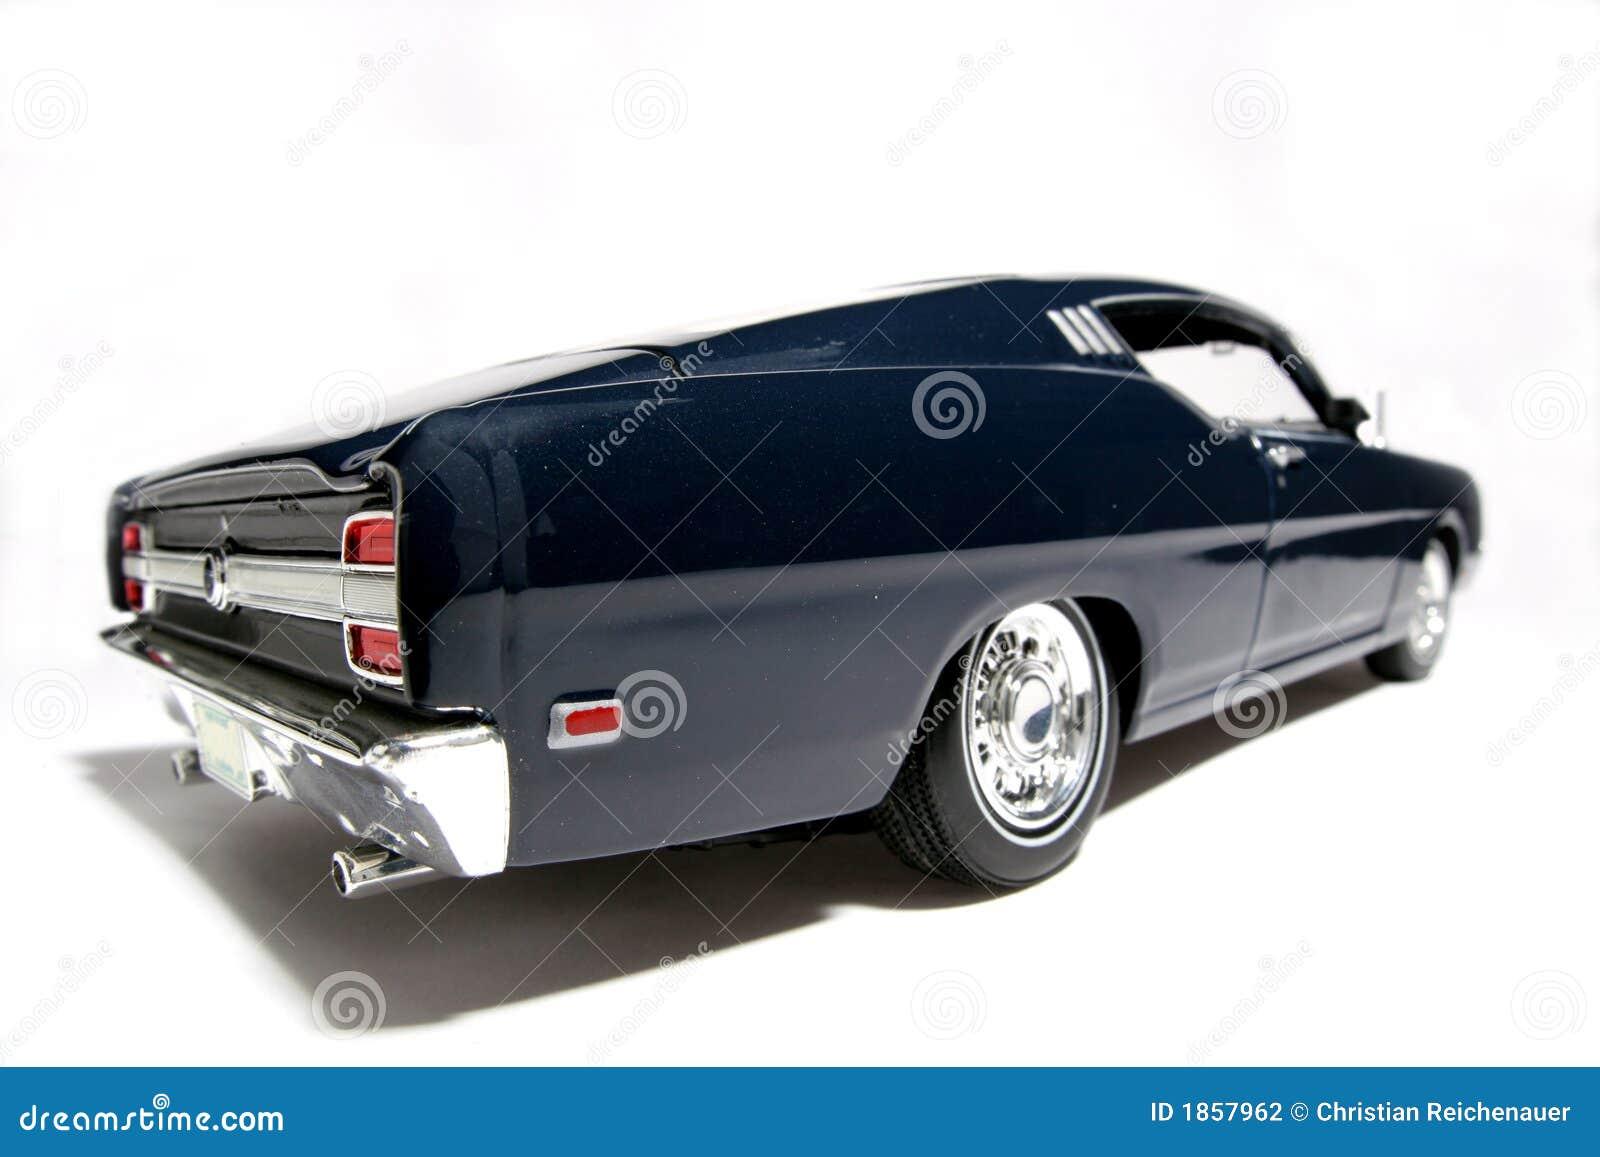 1969 Ford Torino Talladega Metal Scale Toy Car Fisheye 2 Stock Fairlane Muscle Cars Download Photo Image